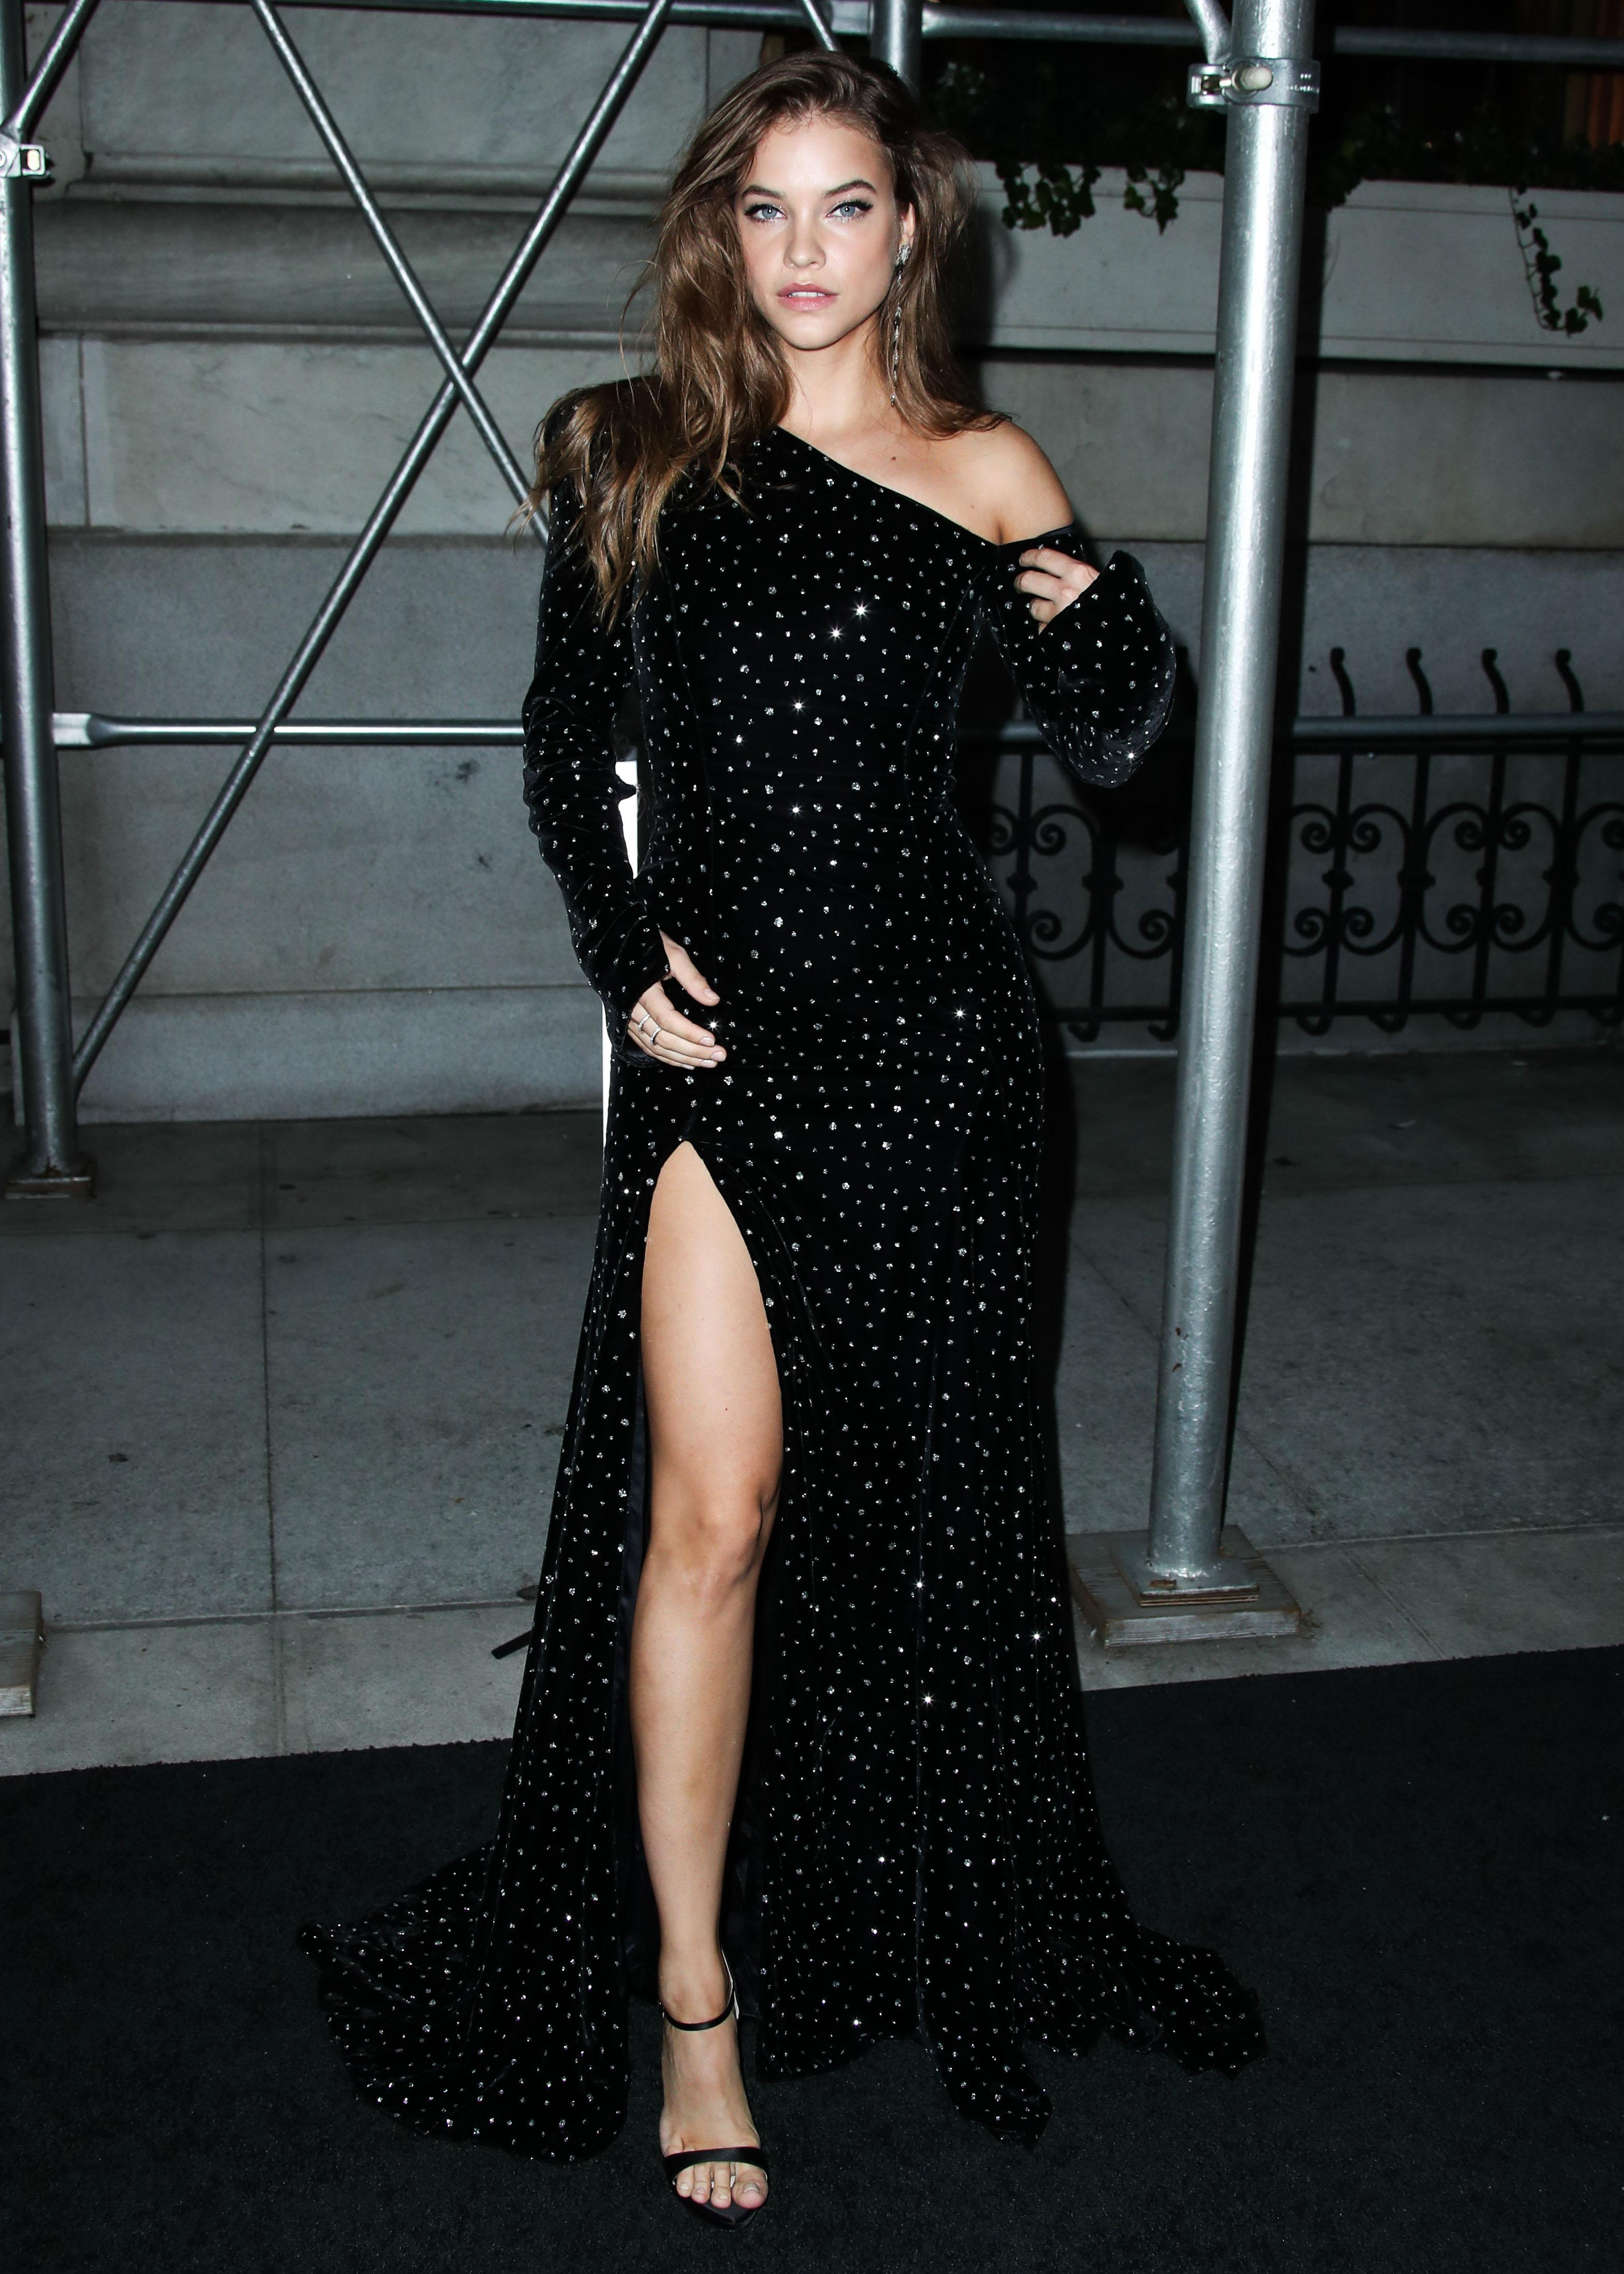 Feet Barbara Di Creddo nudes (27 photo), Ass, Leaked, Boobs, braless 2020